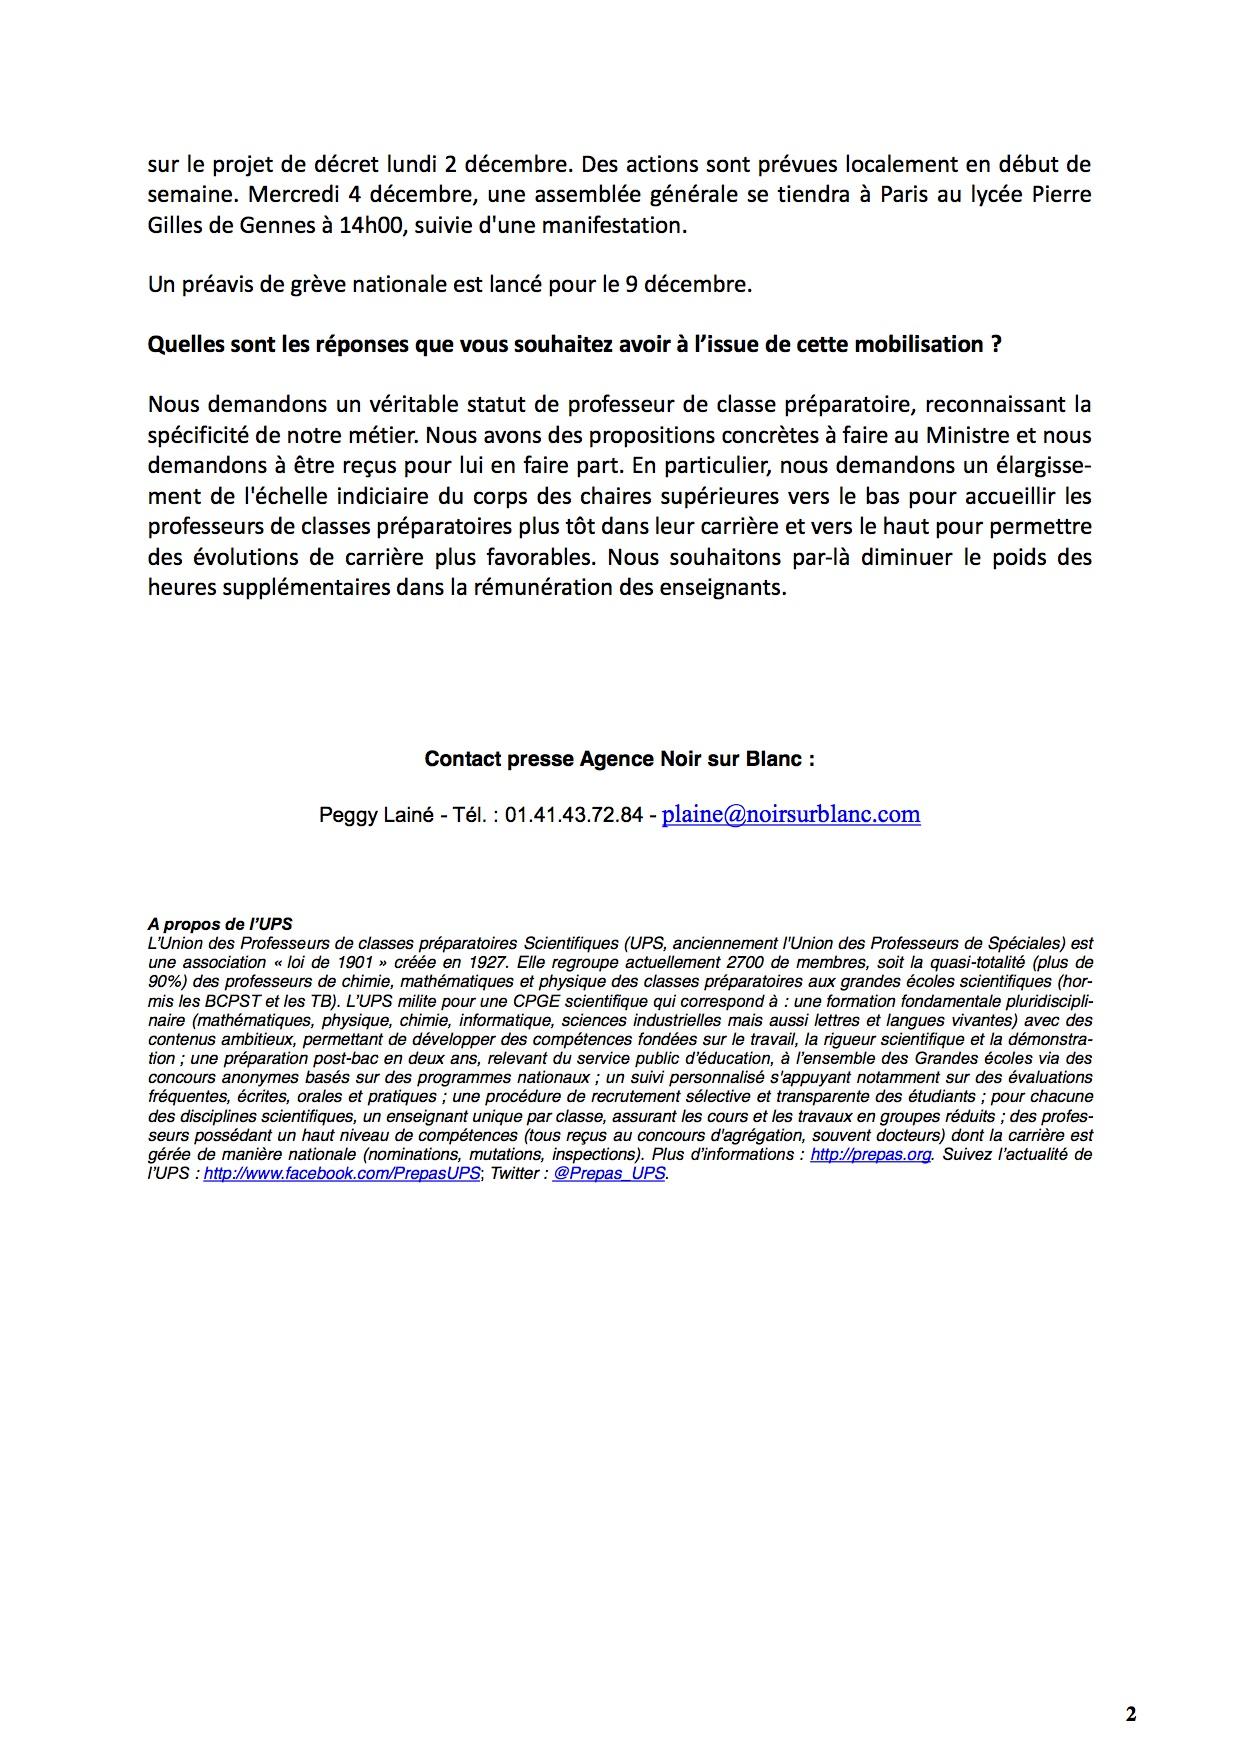 http://static.blog4ever.com/2012/06/704962/Fronde-professeurs-CPGE_021213_VF2.jpg